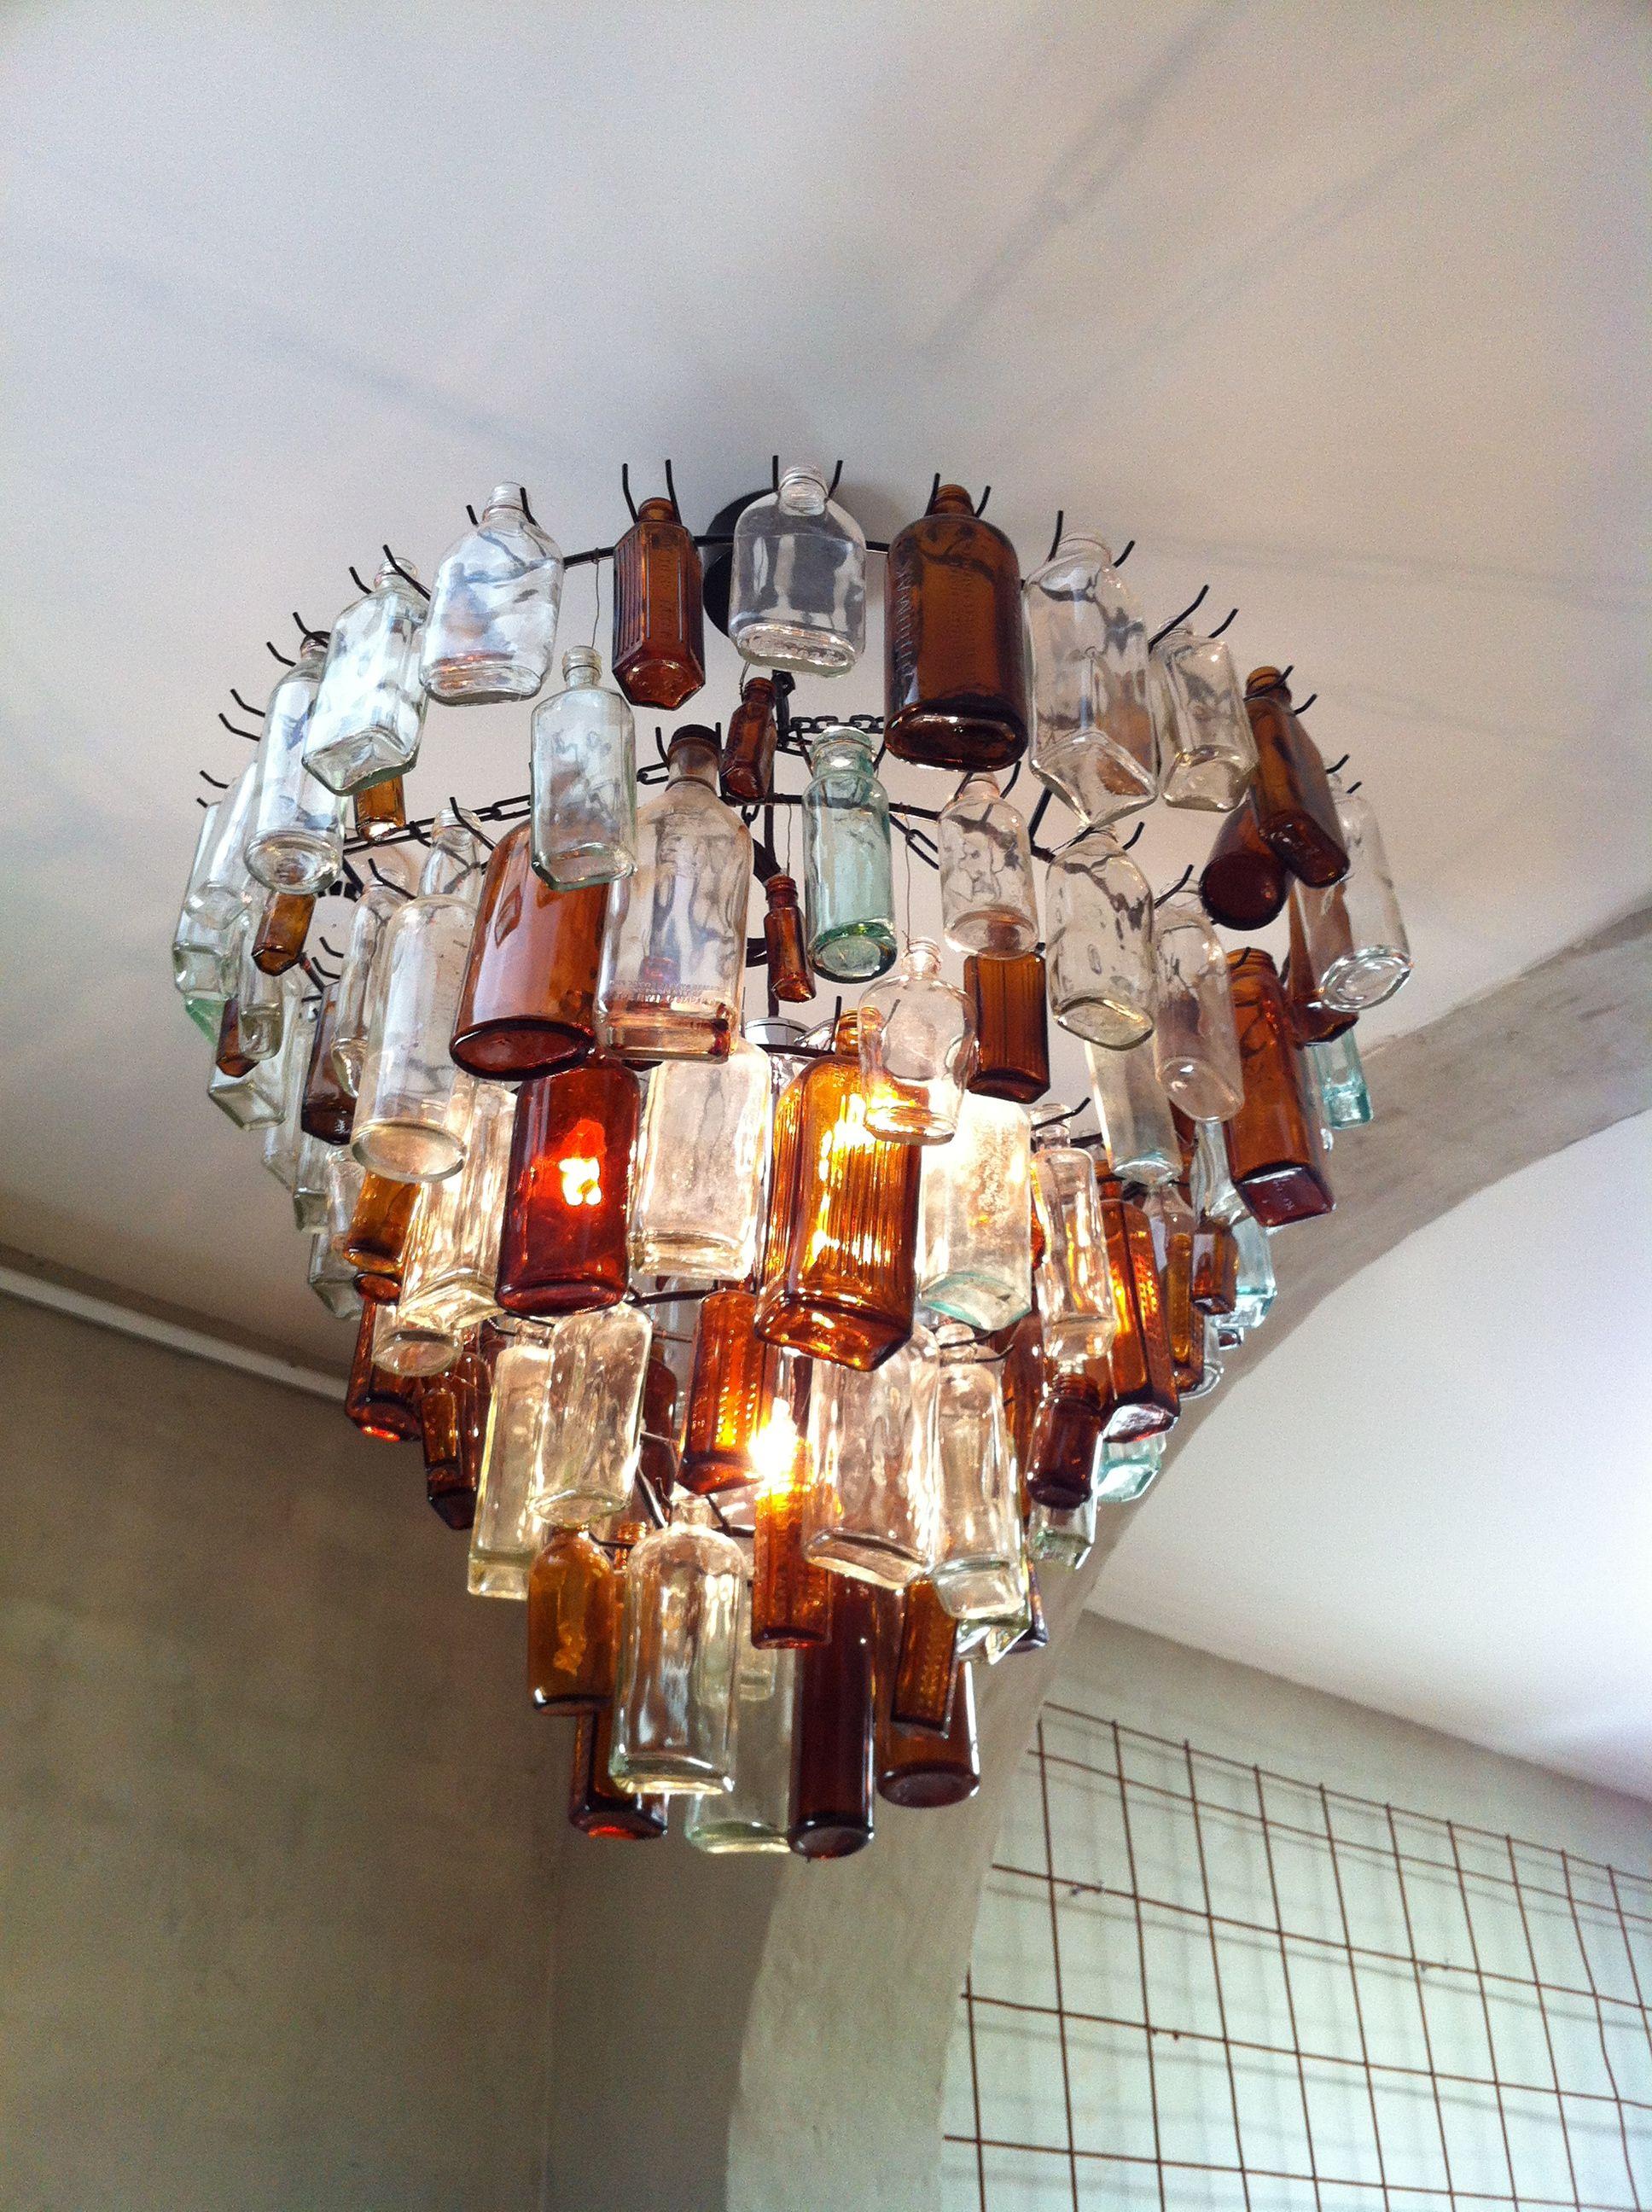 Awesome chandelier ethos cafe hobart diy crafty clever awesome chandelier ethos cafe hobart arubaitofo Gallery